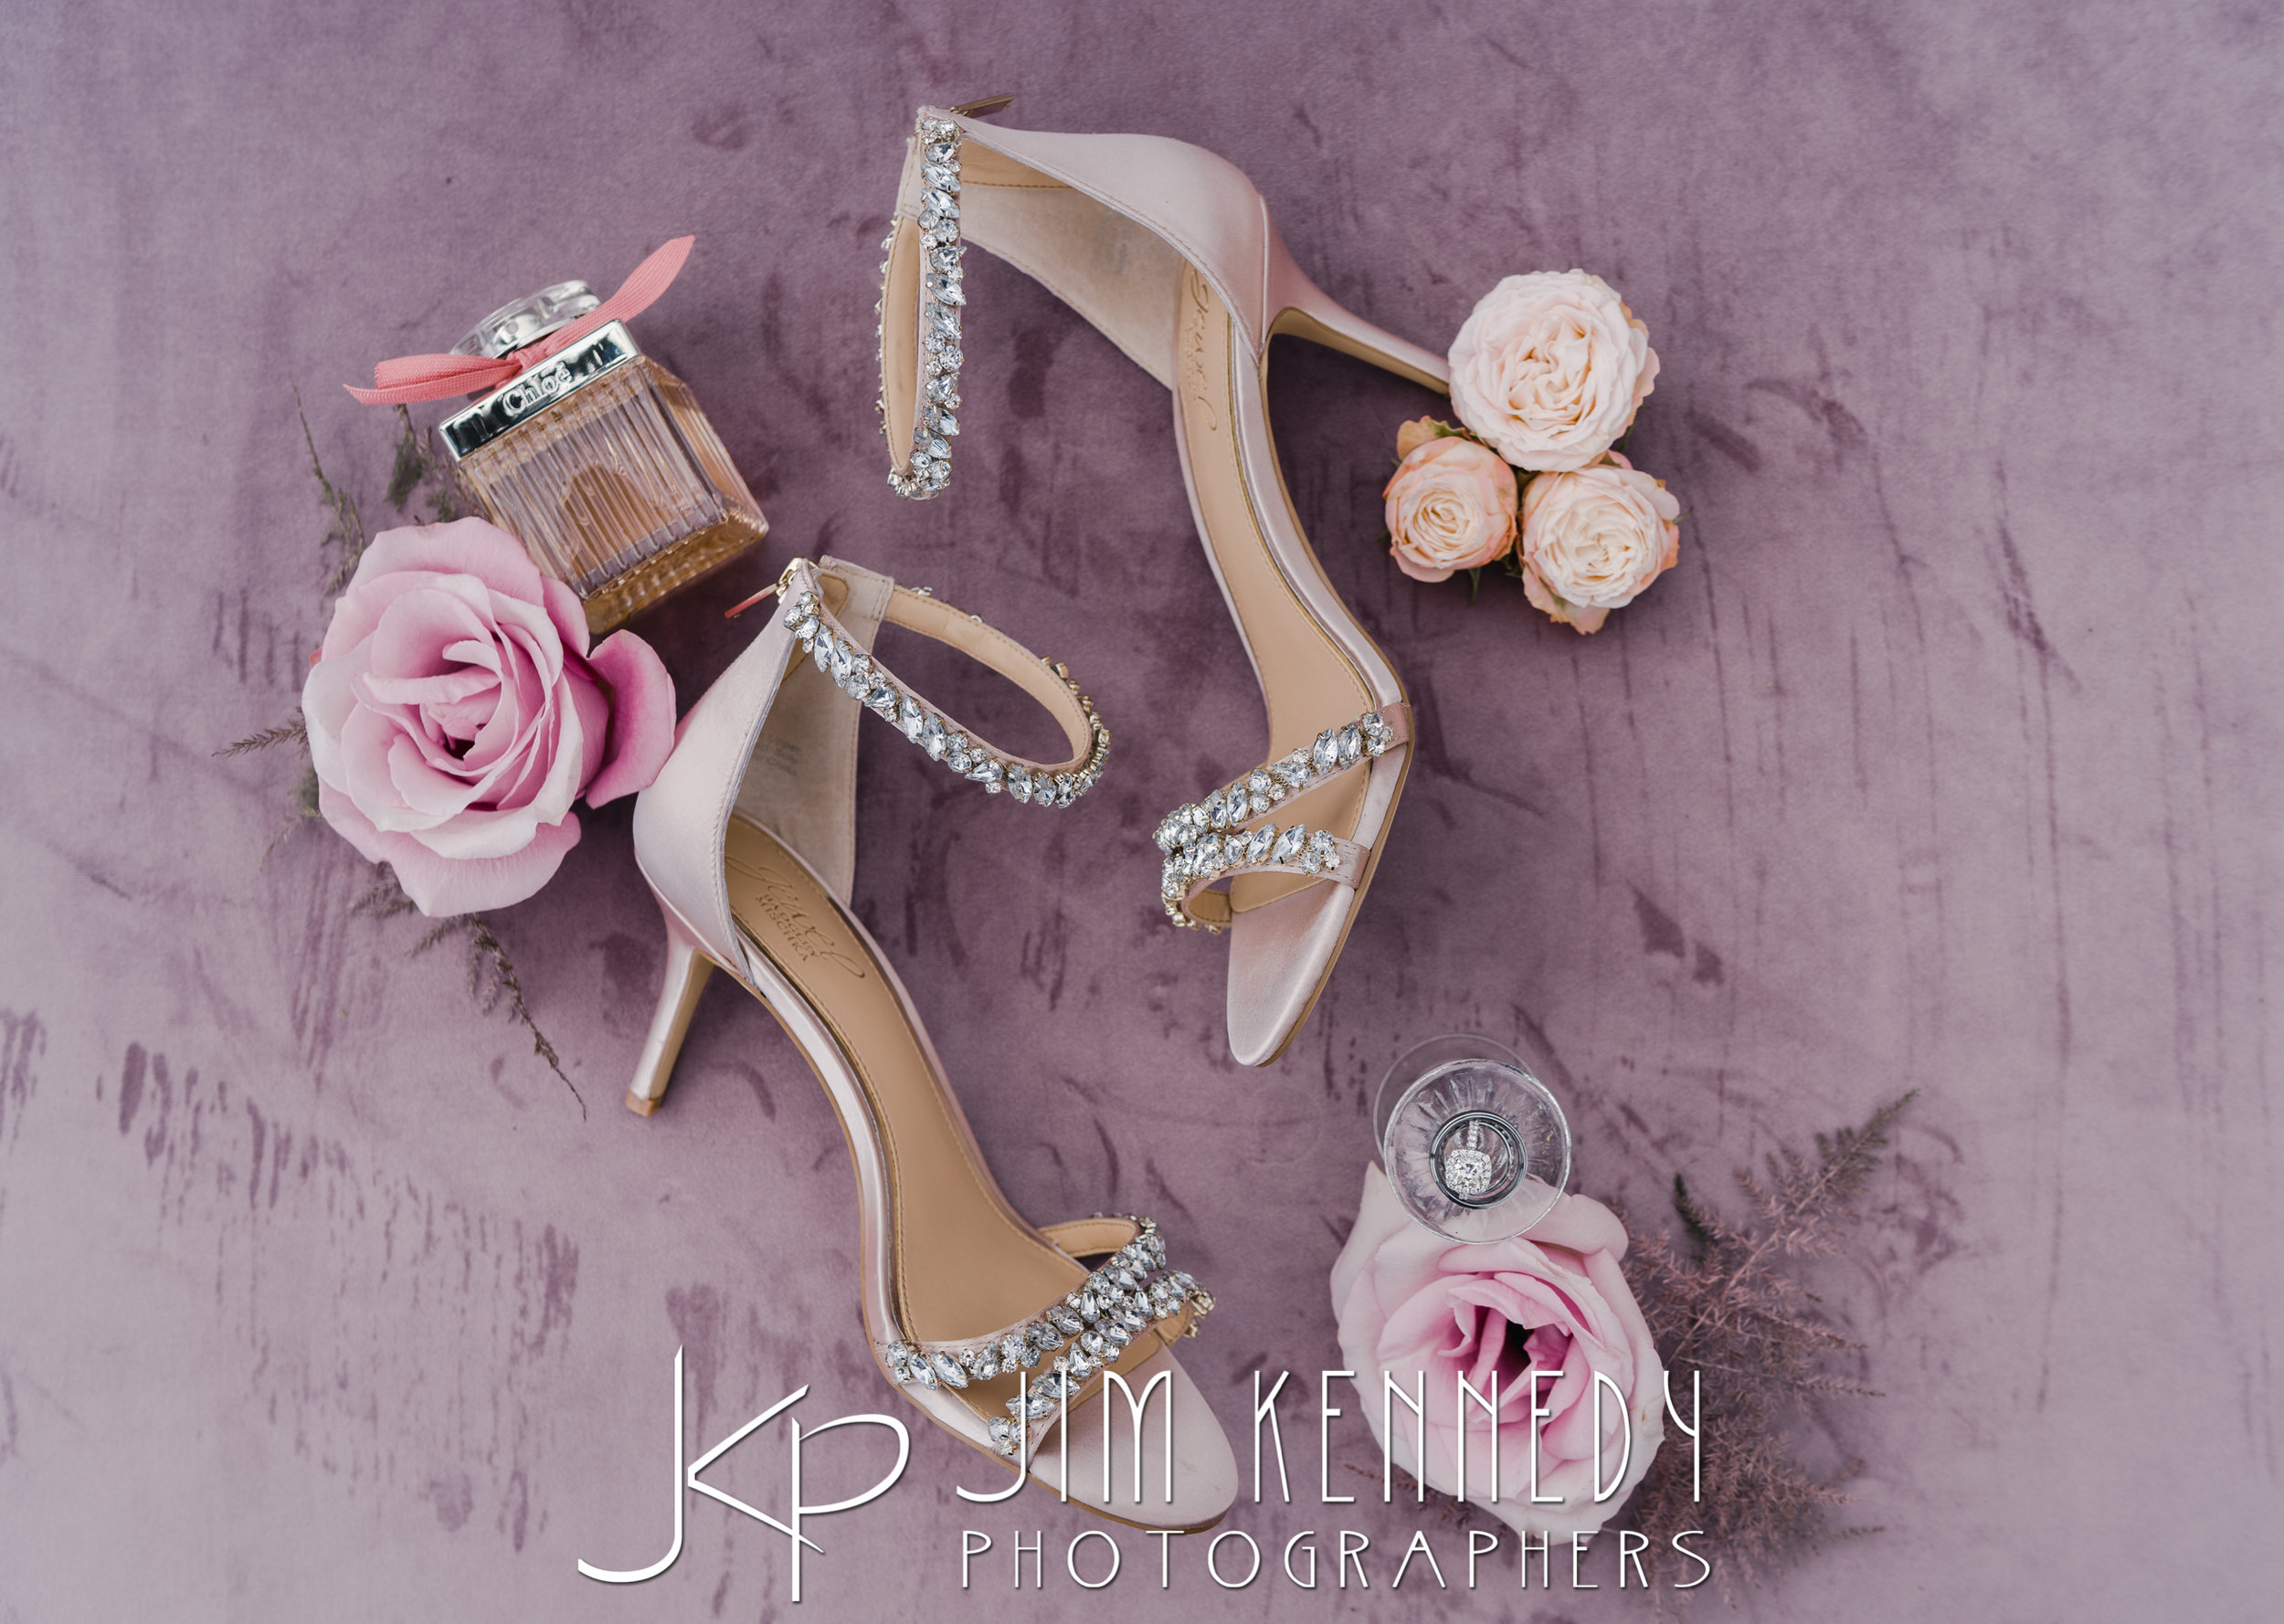 pelican-hill-wedding-jim-kenedy-photographers_0005.JPG